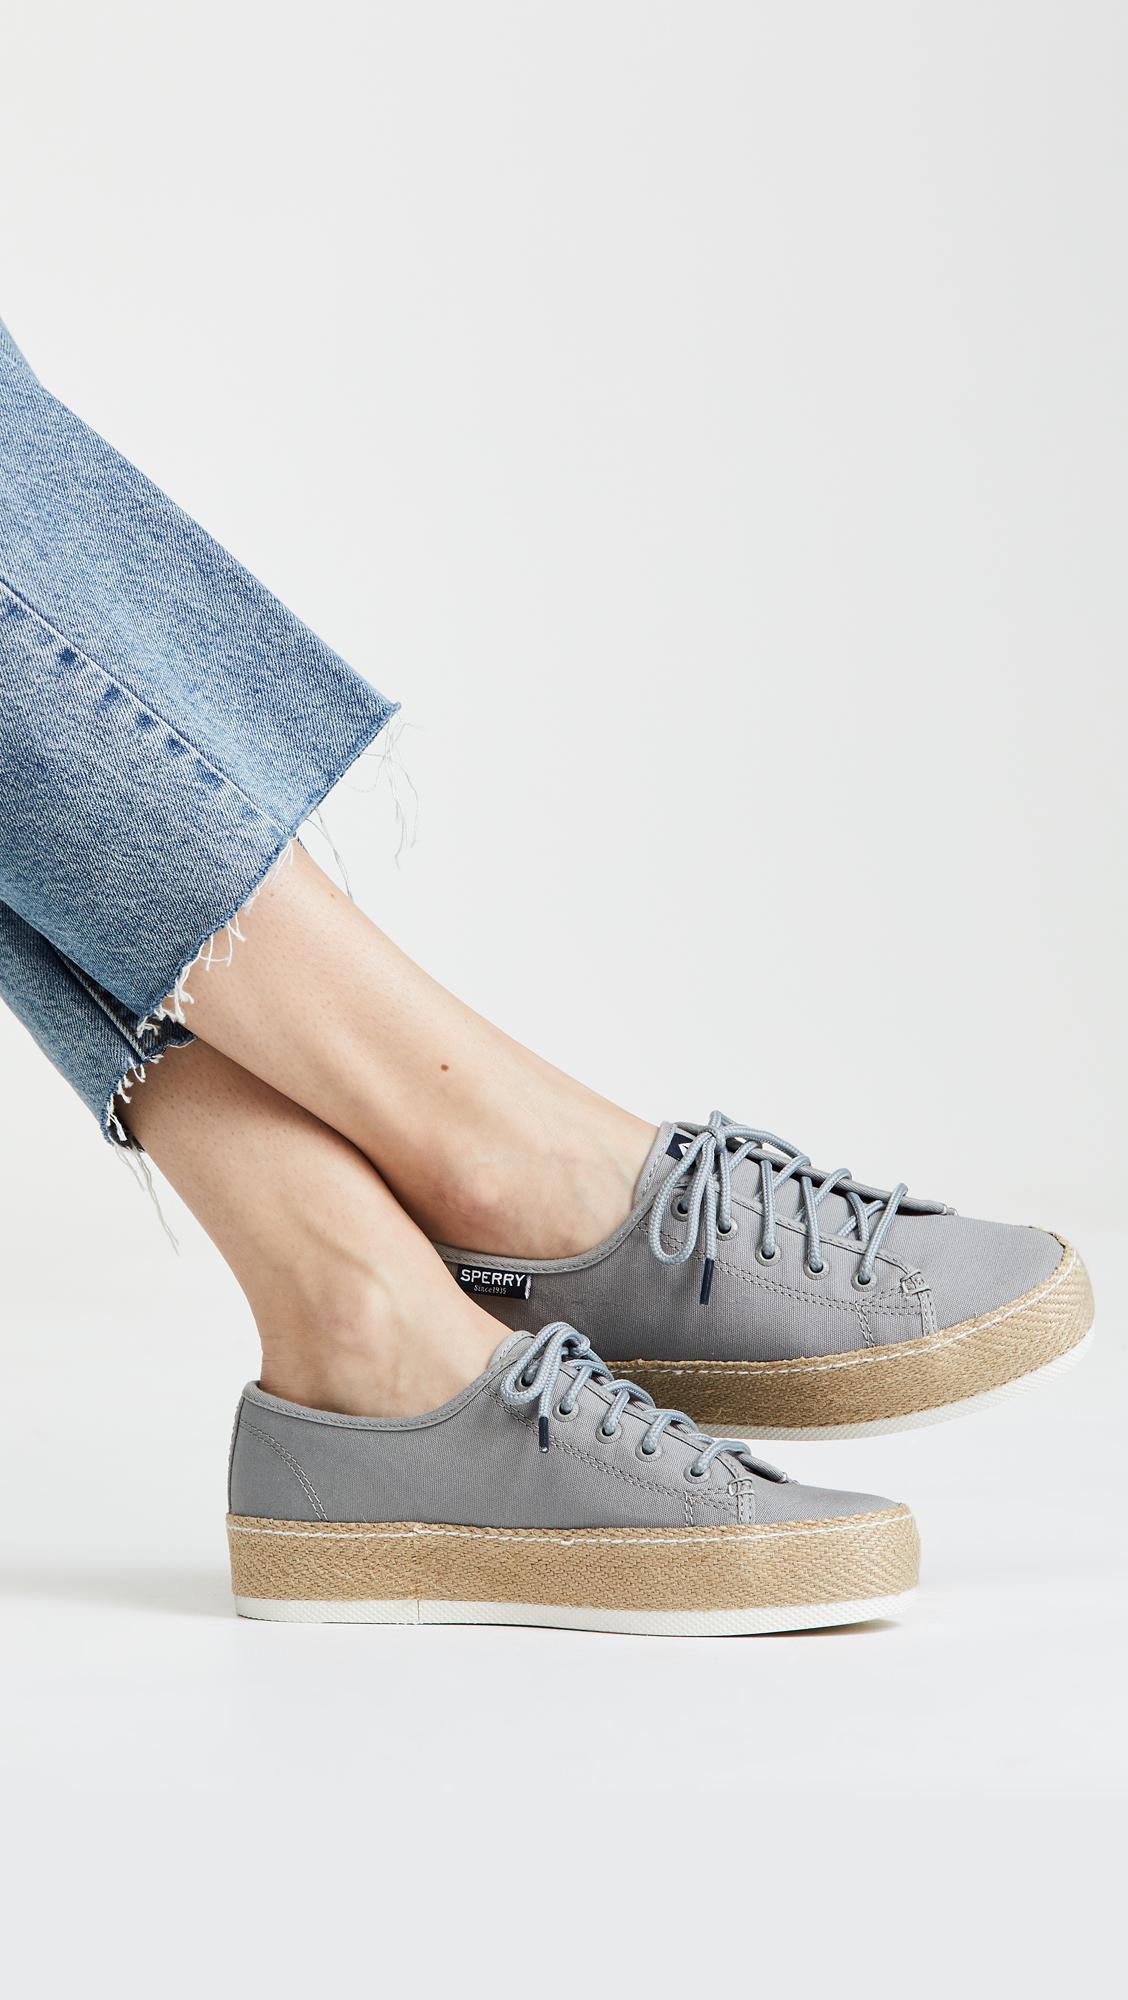 14566e6497f9 Sperry Sky Sail Jute Wrap Platform Sneakers